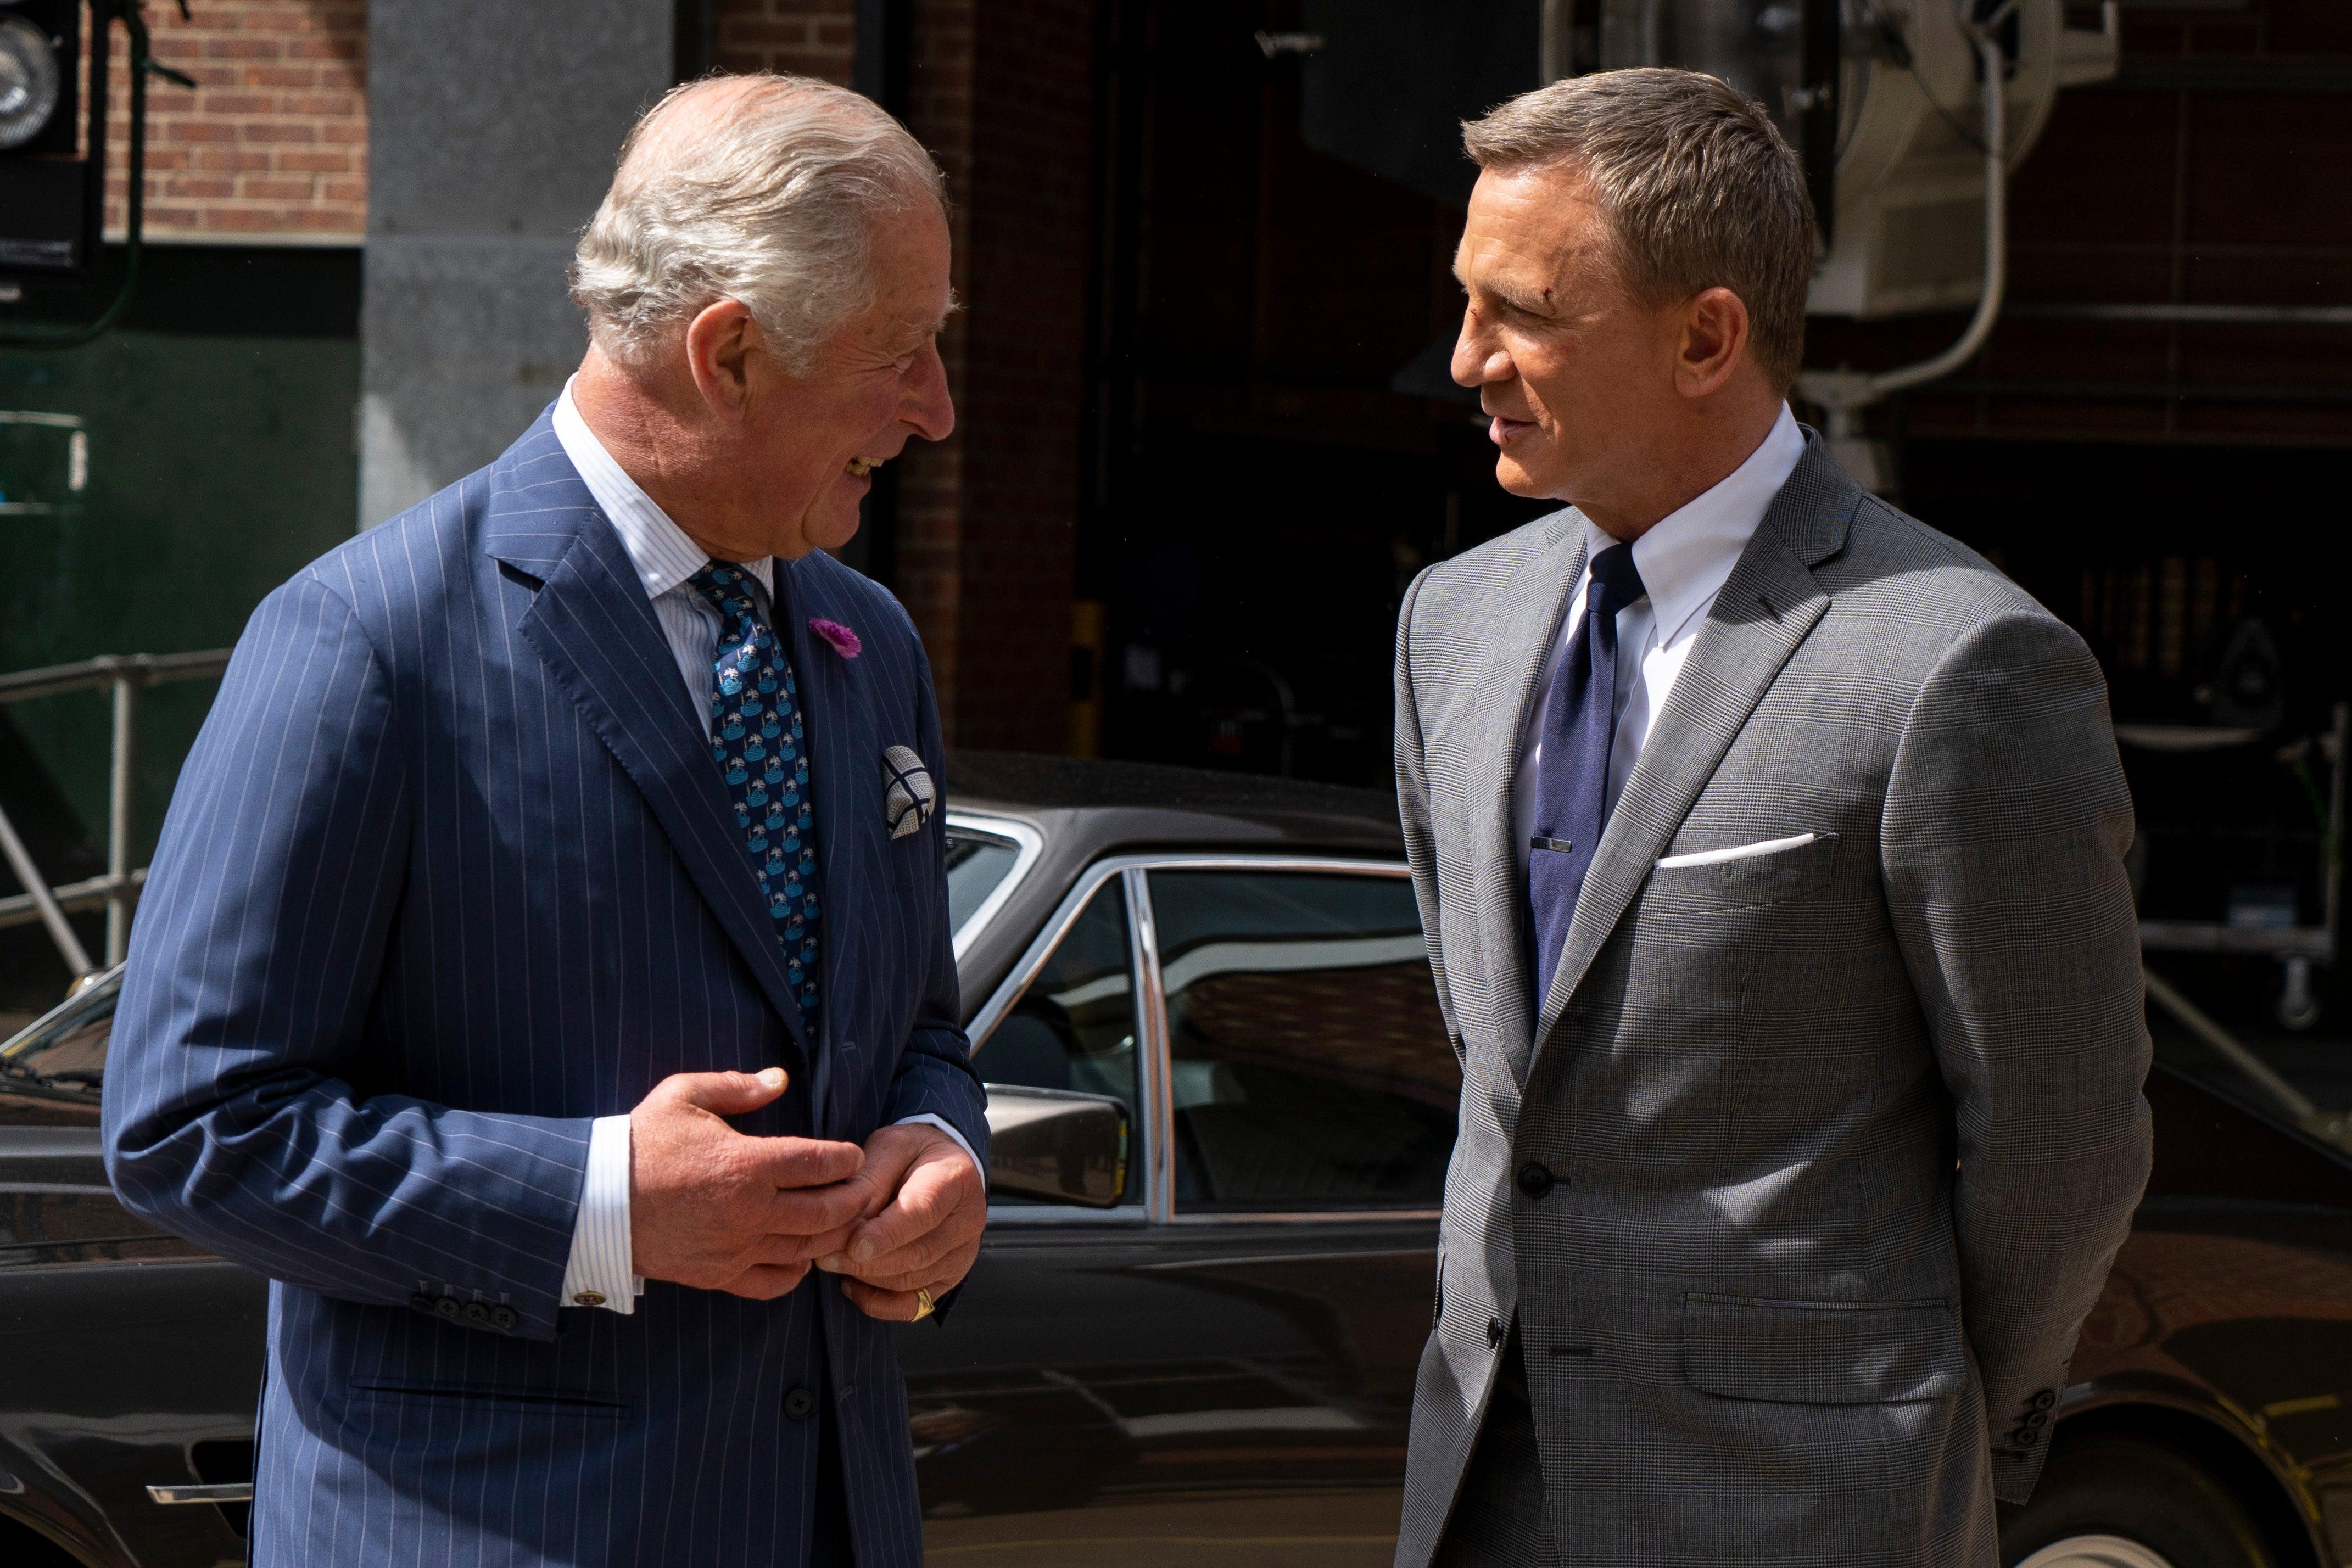 Princ Charles a Daniel Craig při natáčení v Anglii, červen 2019 Autor: Niklas Halle'n - WPA Pool/Getty Images